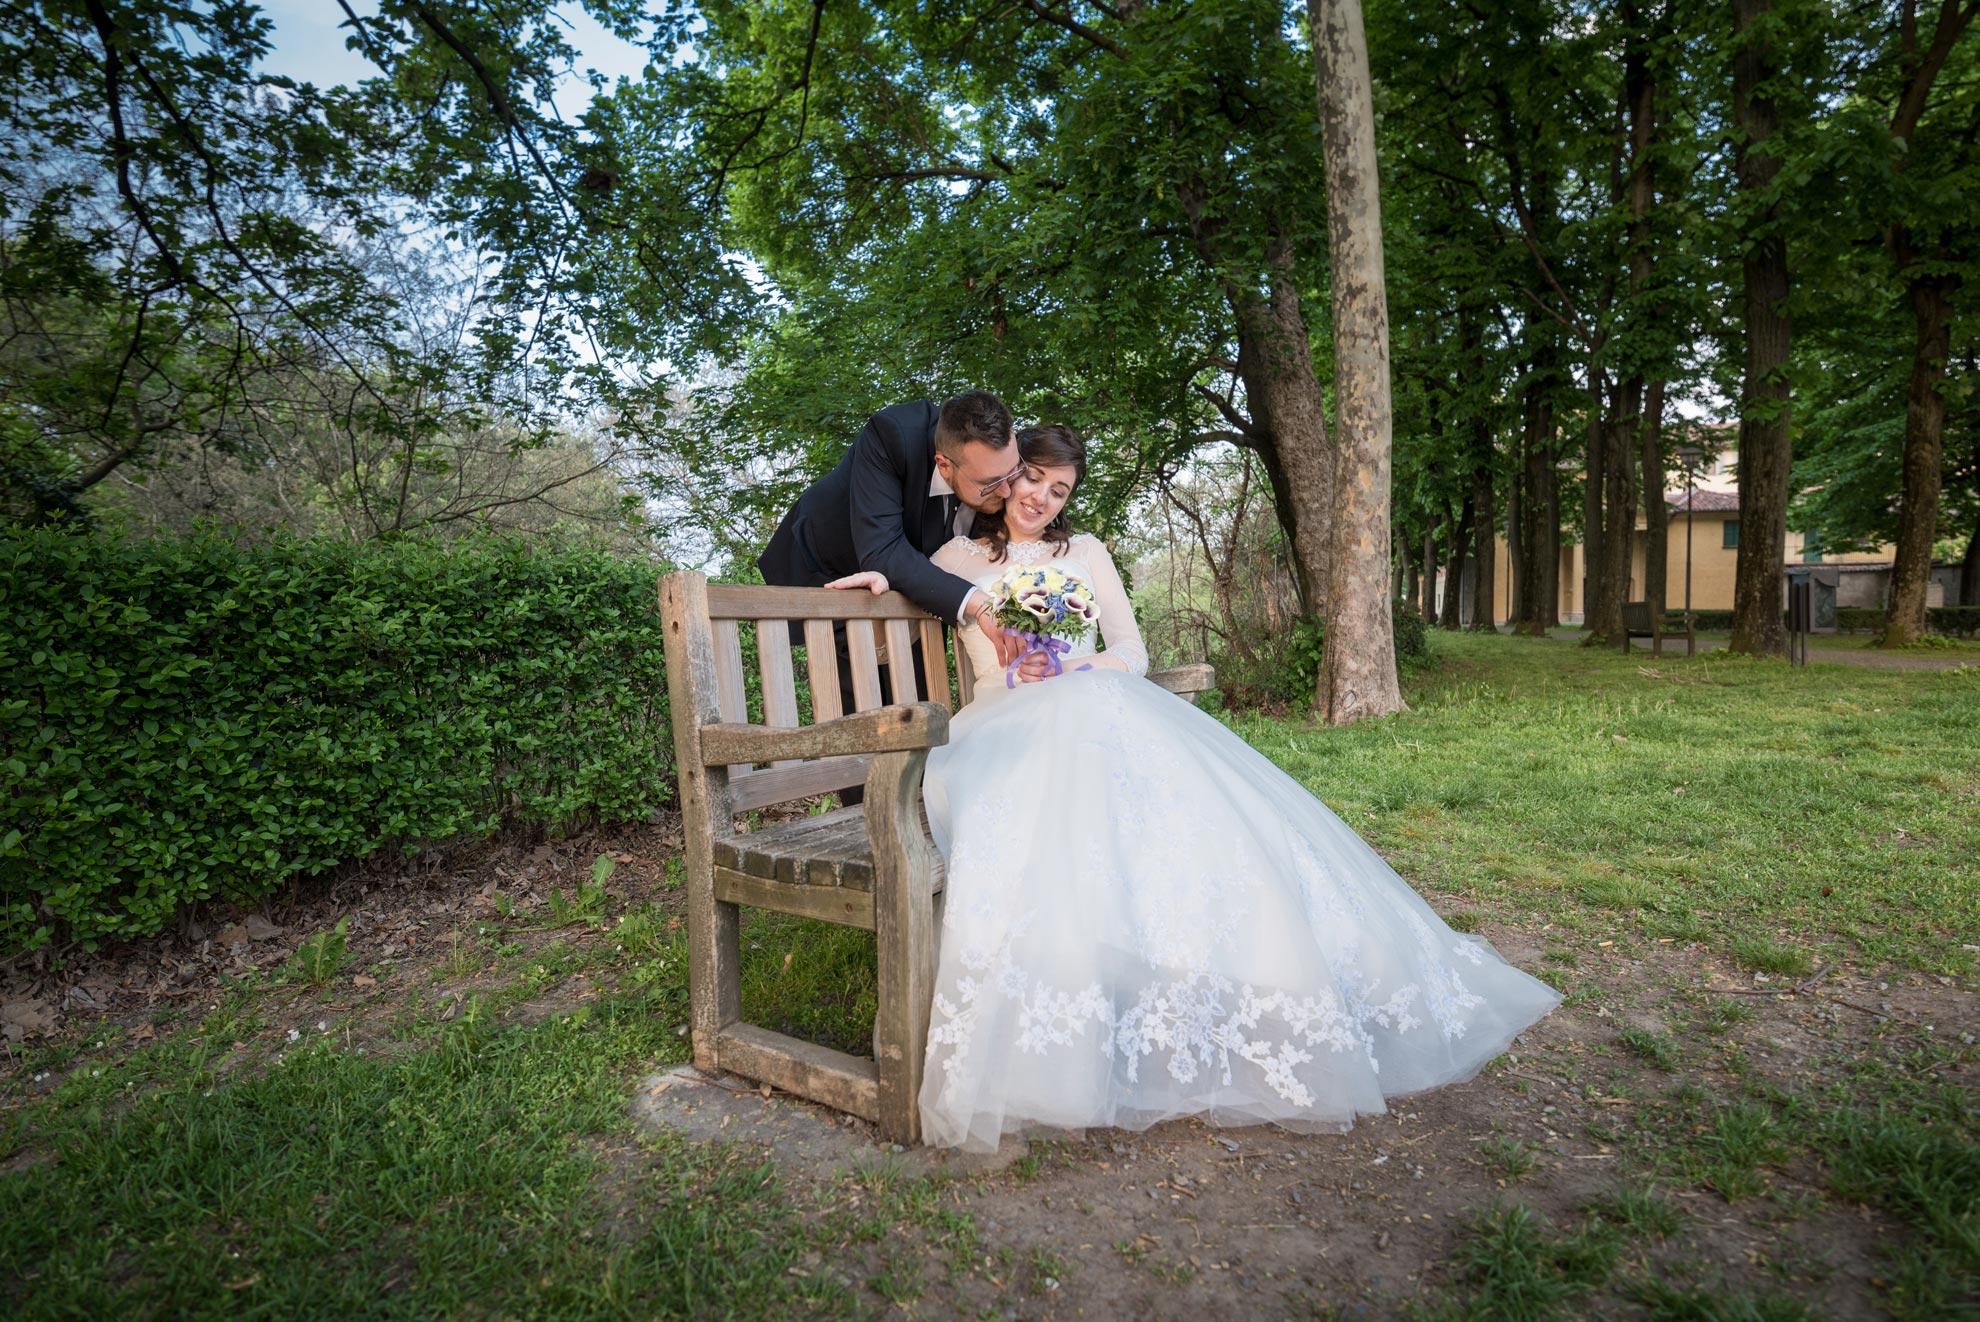 Matrimonio a Narzole Lorenza Diego - DSC 0730 - Fotografo Matrimonio a Cherasco - Fotografo Matrimonio a Cherasco